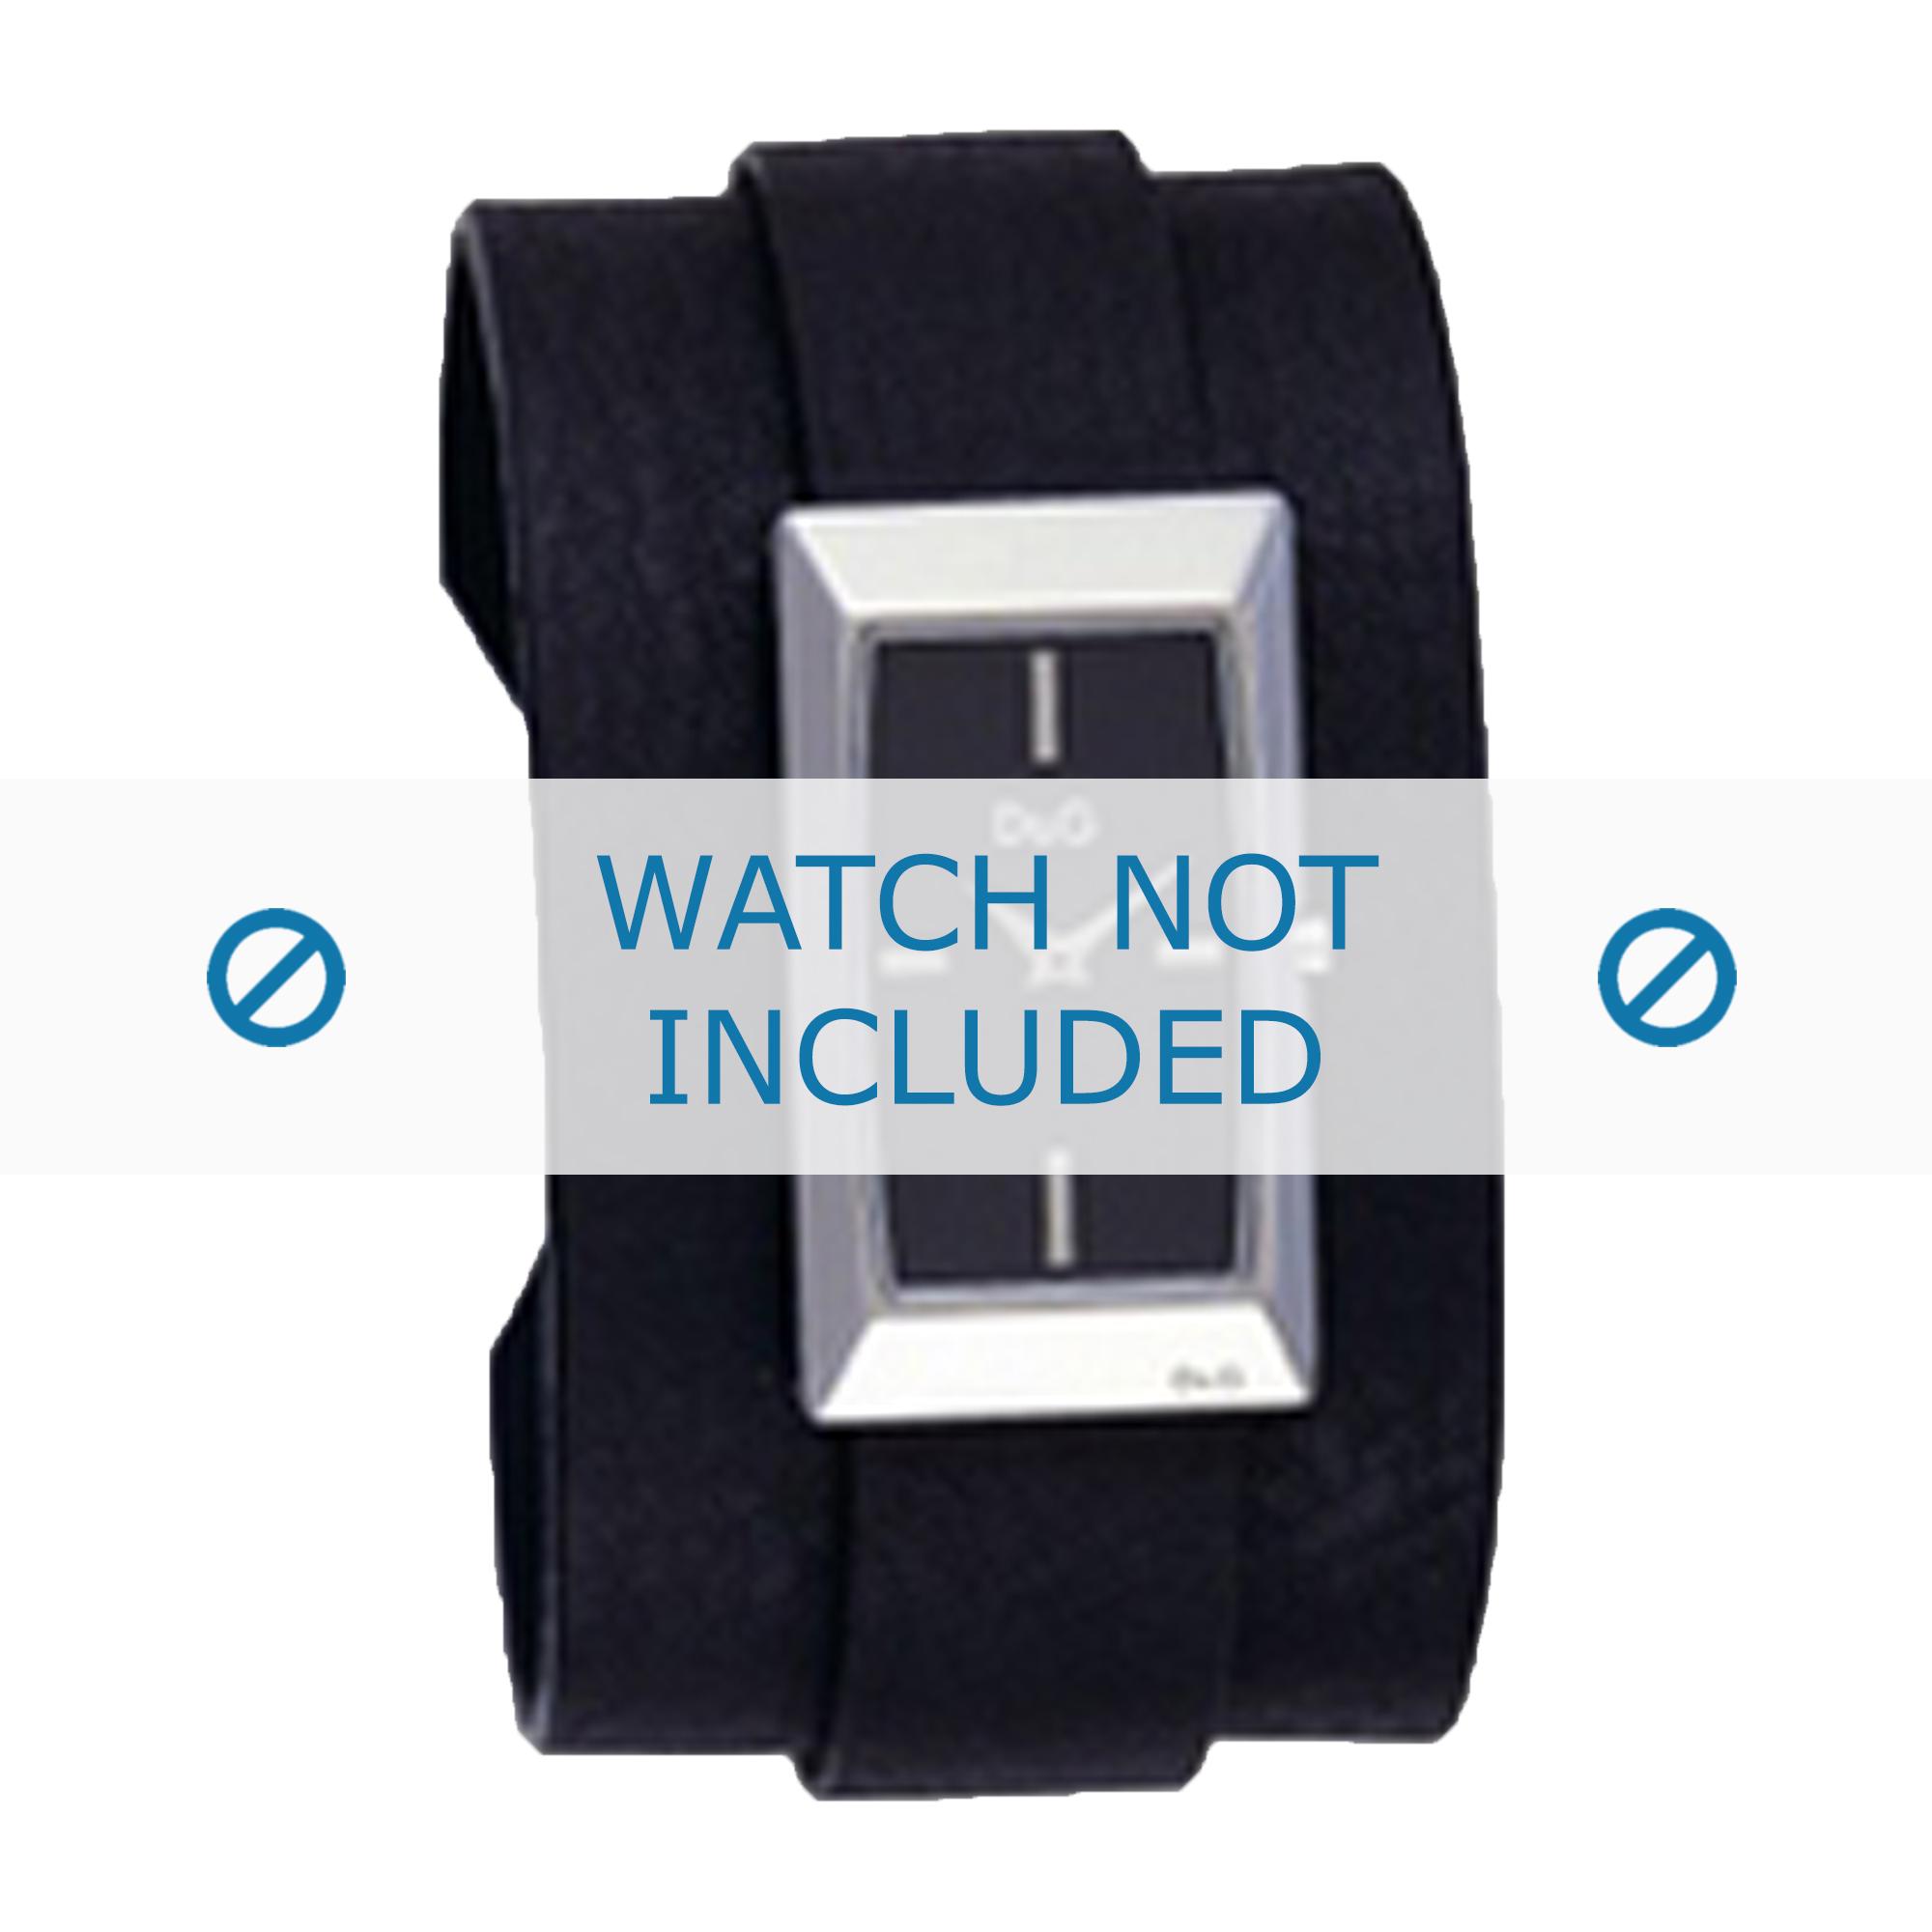 Dolce & Gabbana horlogeband 3719040031 Leder Zwart + zwart stiksel